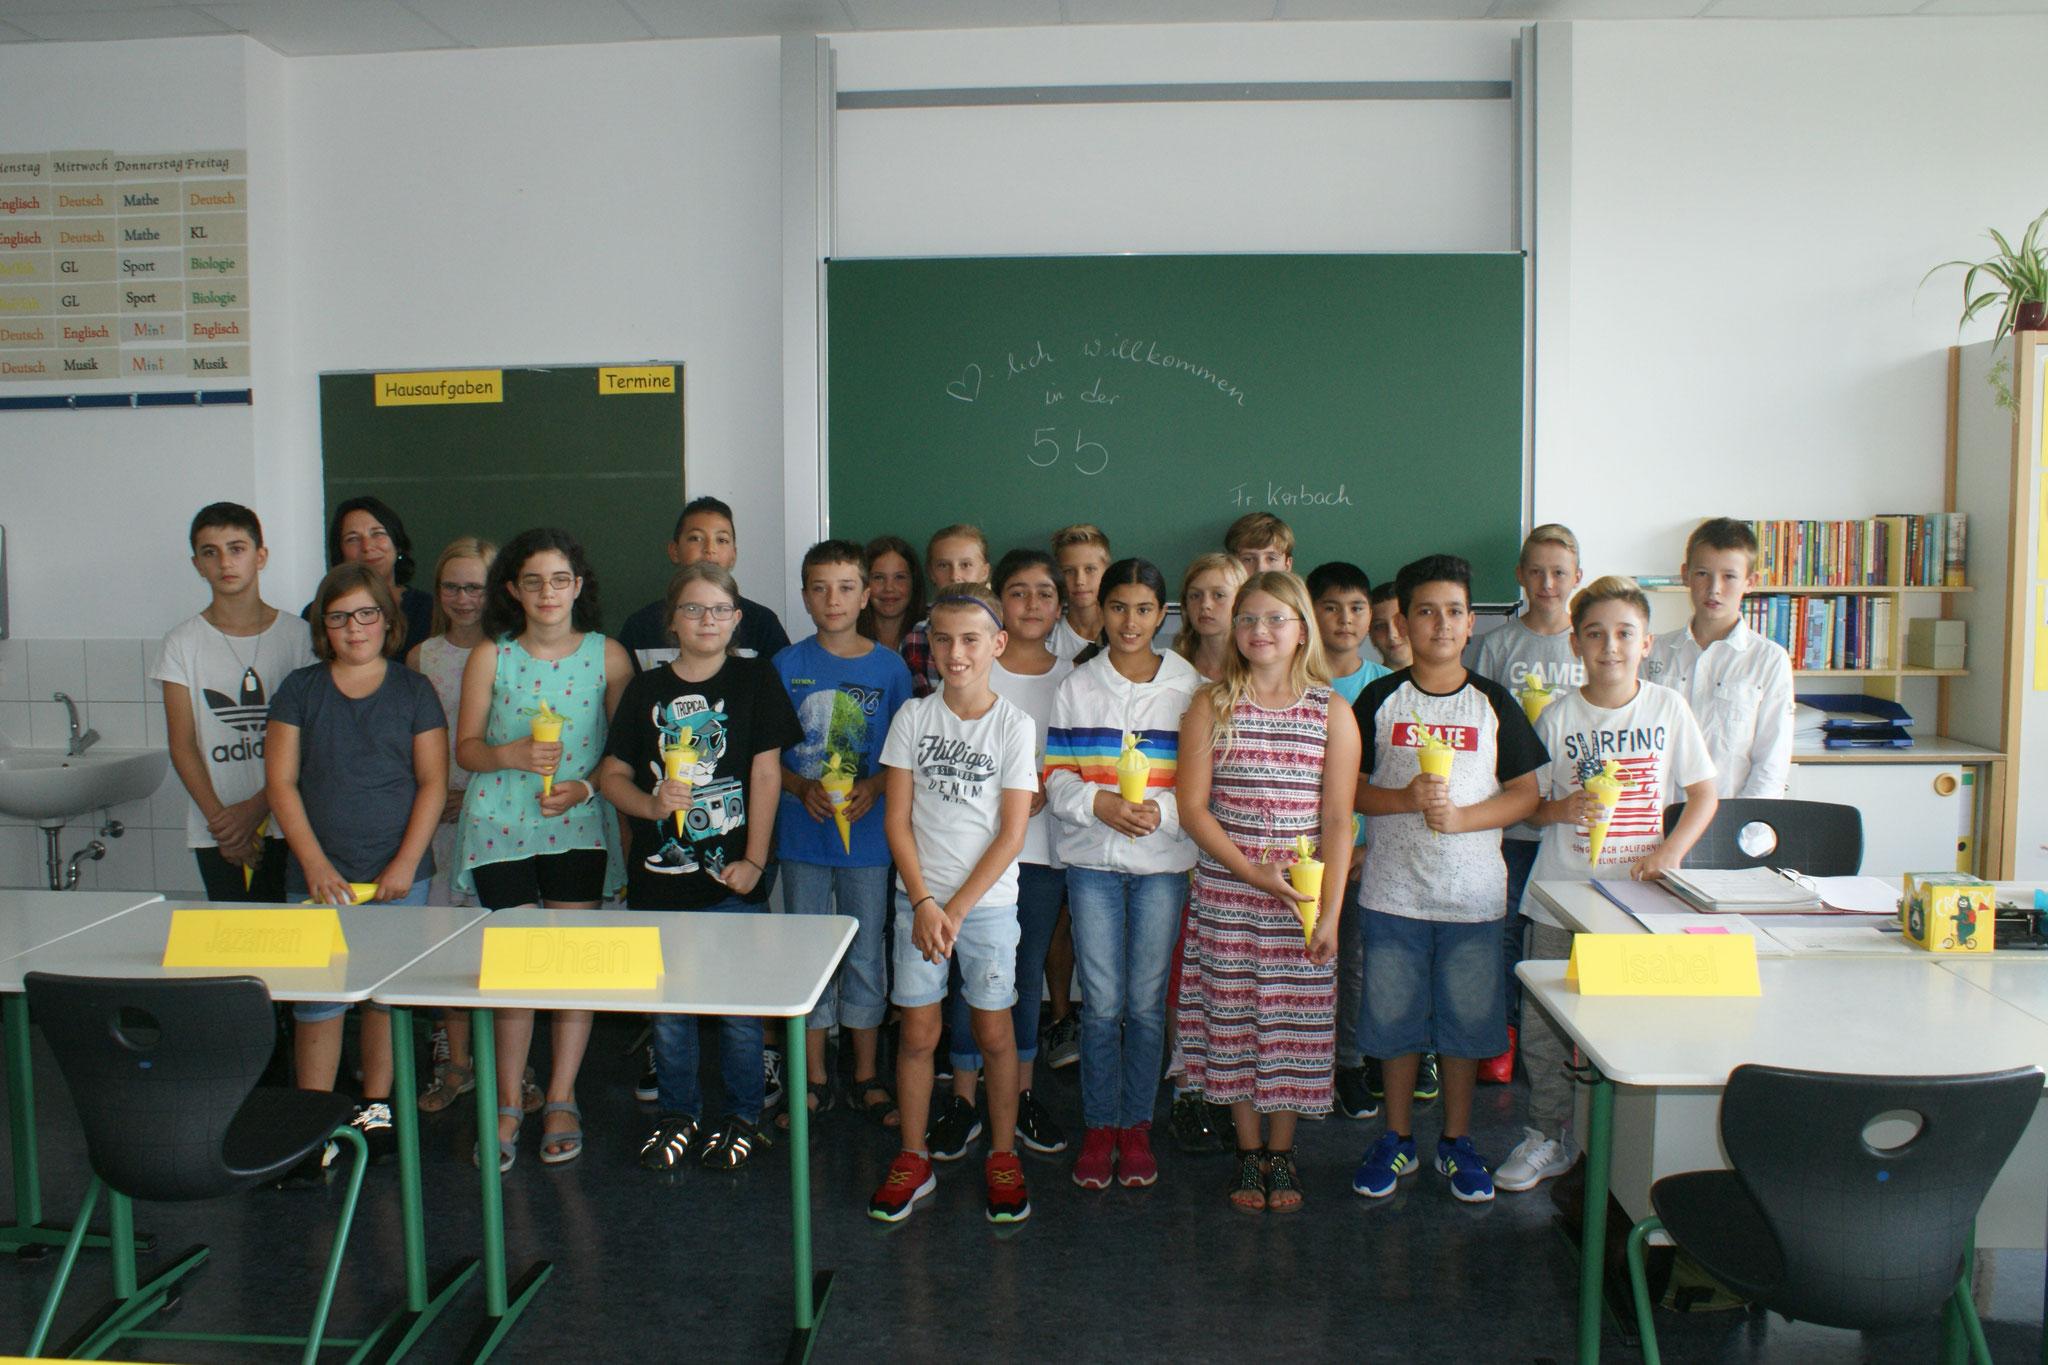 Klasse 5b, Klassenlehrer Sabine Korbach